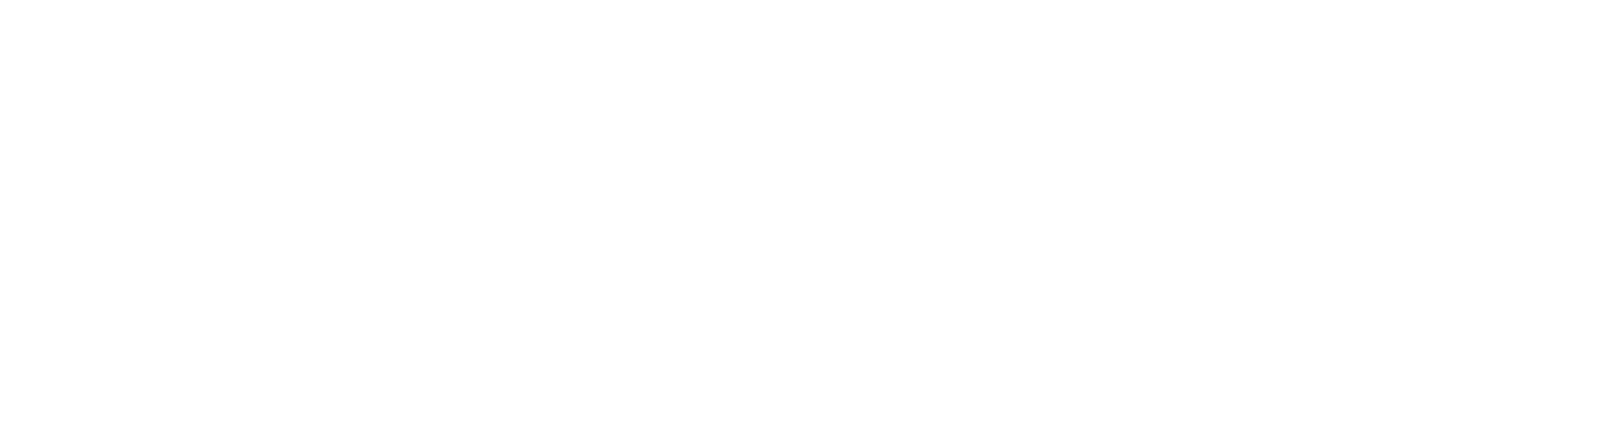 RareGuru Monochrome White Logo